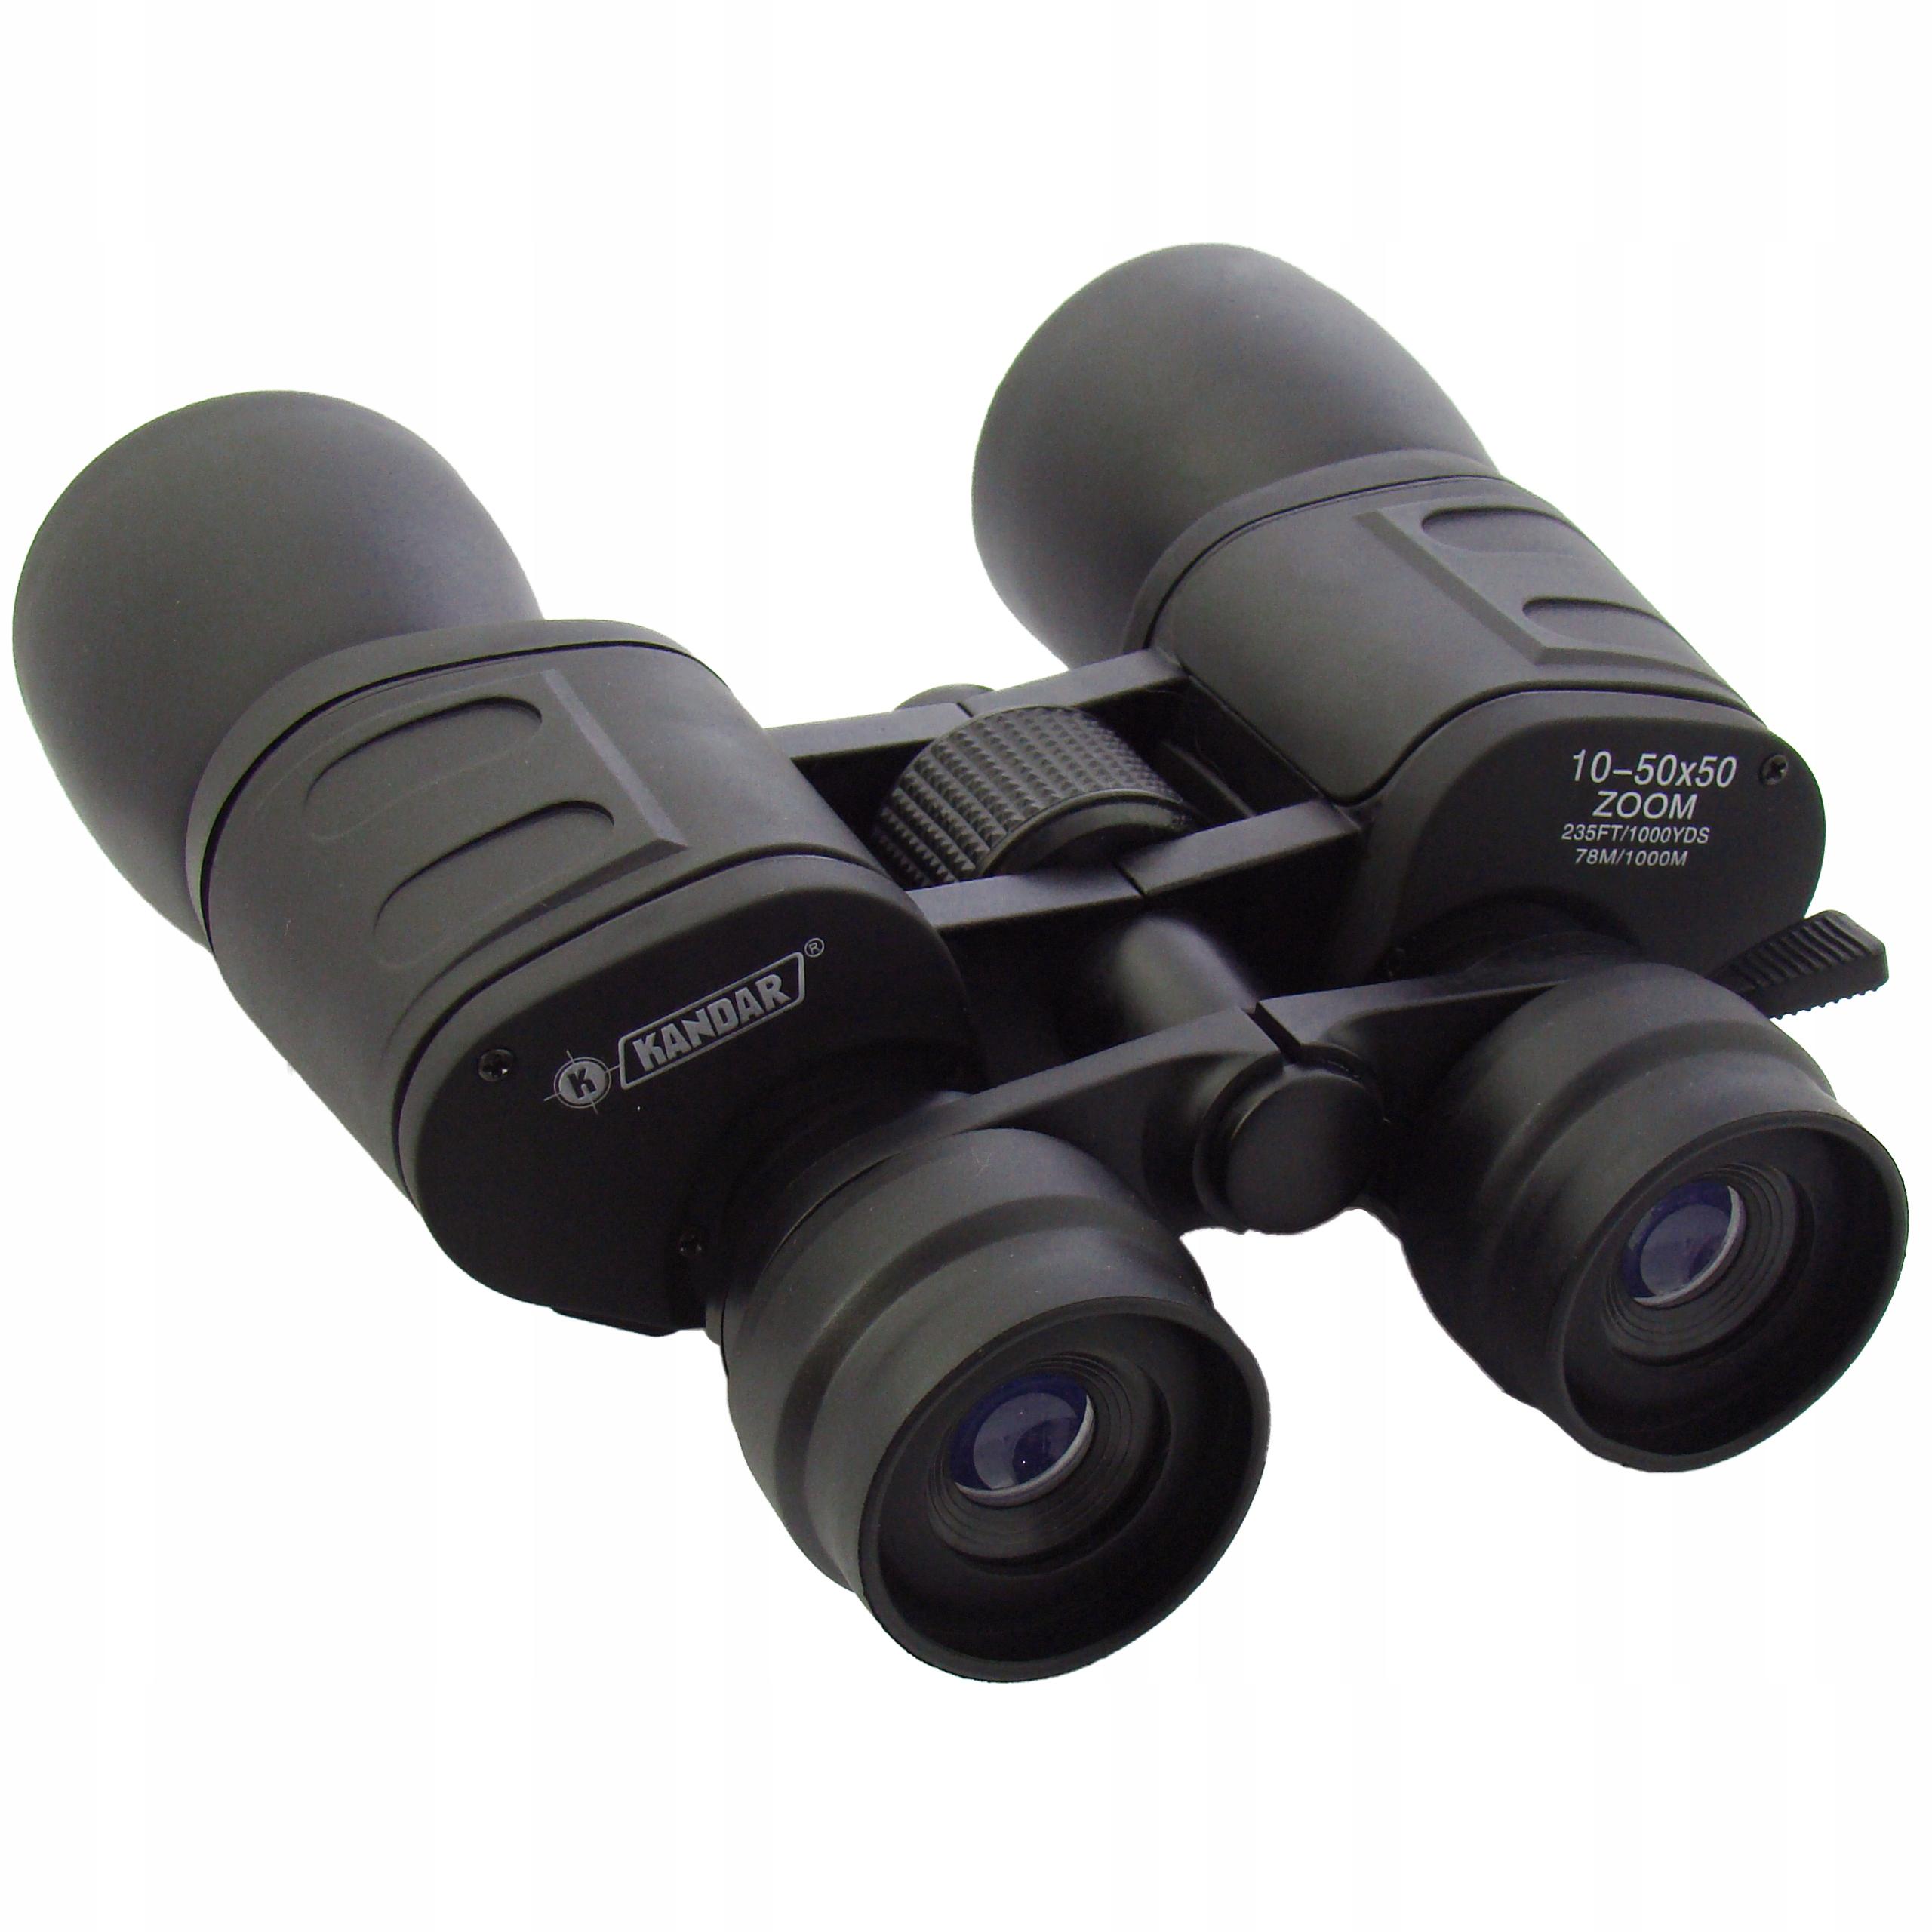 Astronomické ďalekohľady zoom 10-60x50 HD kvalita HQ